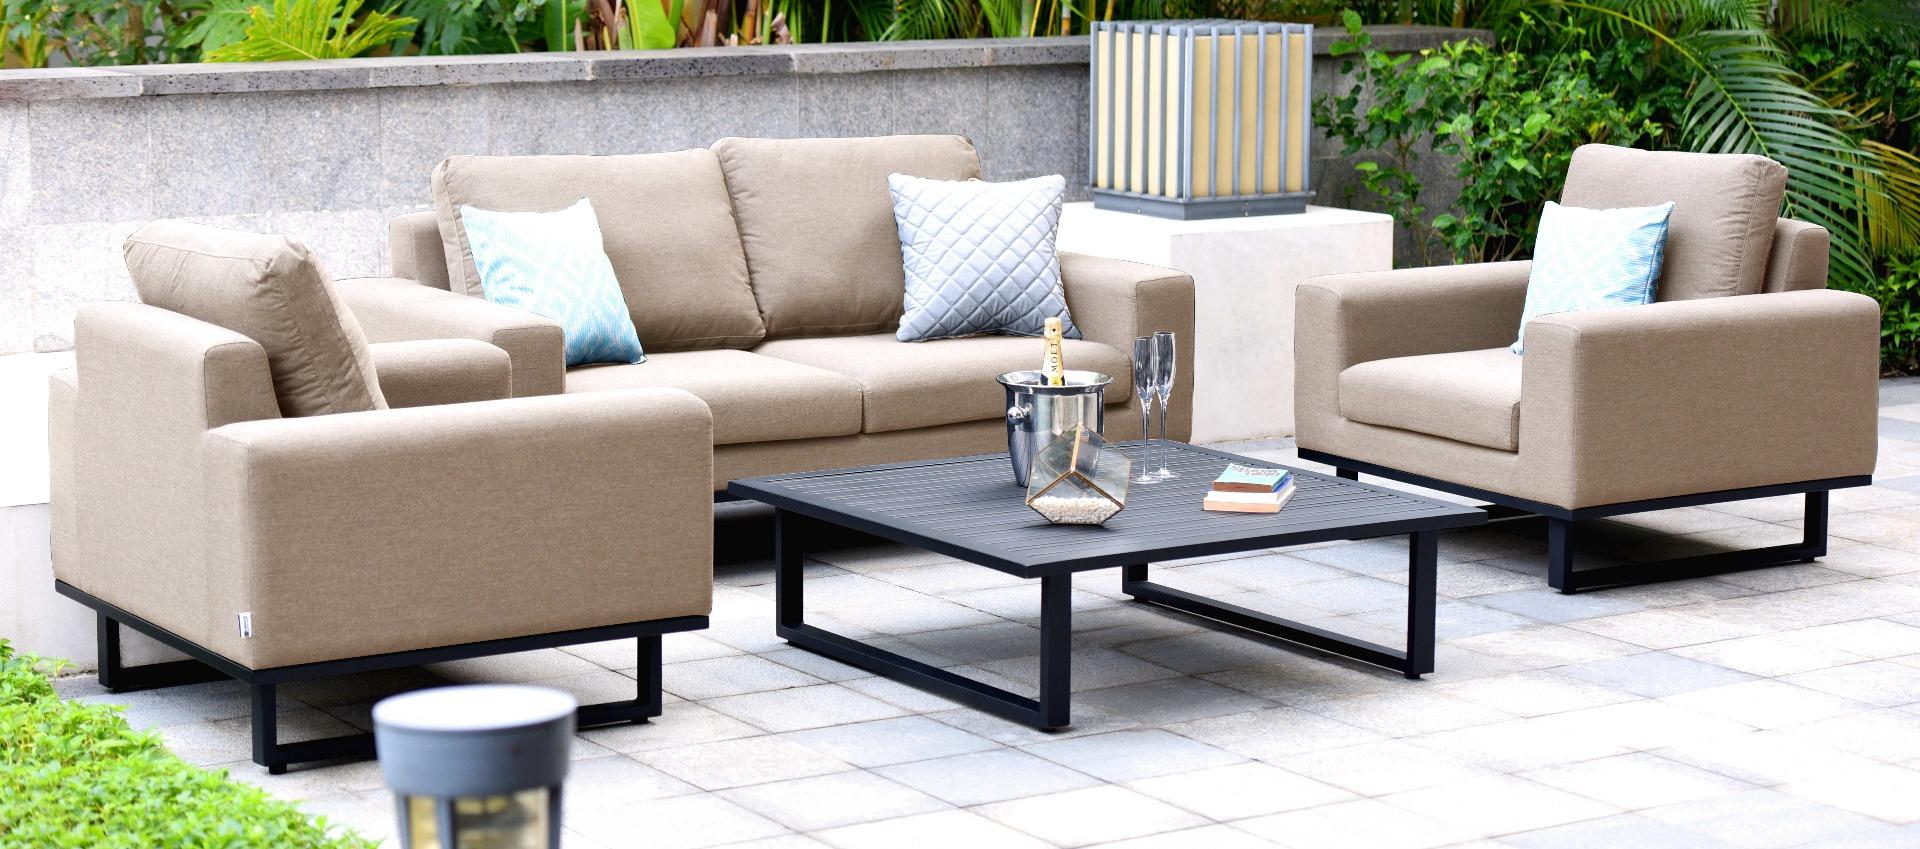 Maze Lounge - Outdoor Fabric Ethos 2 Seat Sofa Set - Taupe